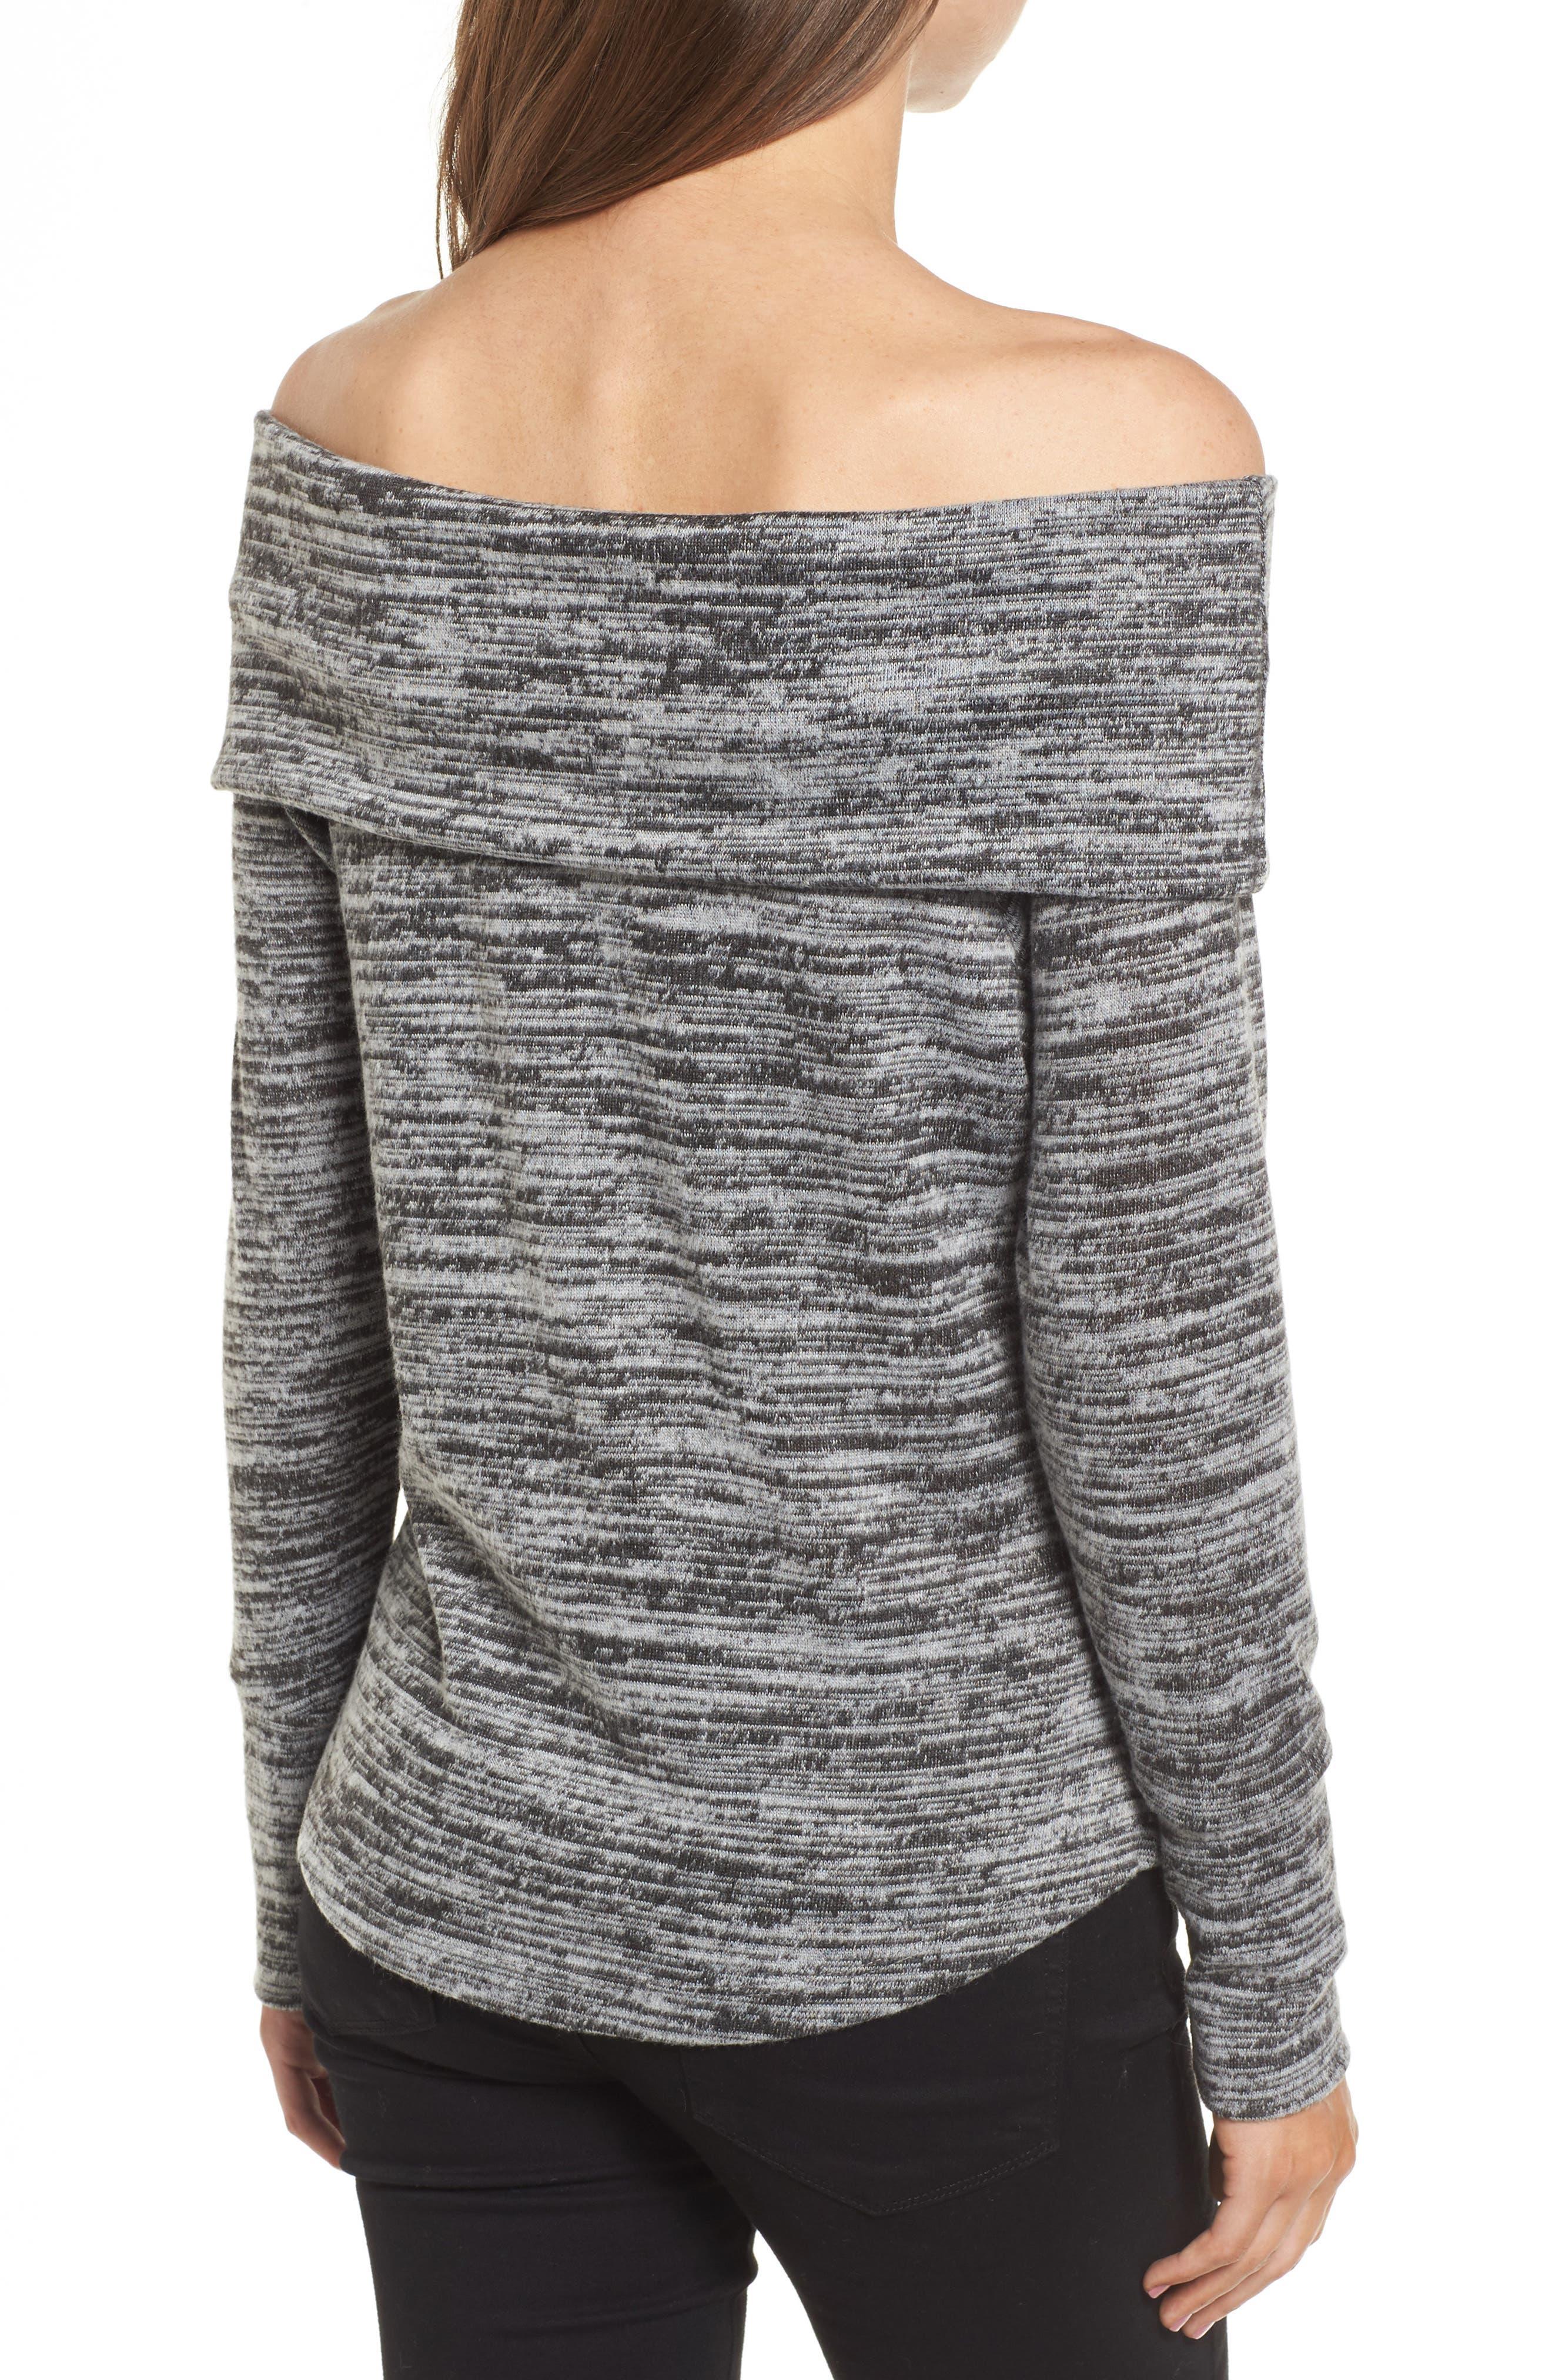 Off the Shoulder Sweatshirt,                             Alternate thumbnail 2, color,                             Grey/ Black